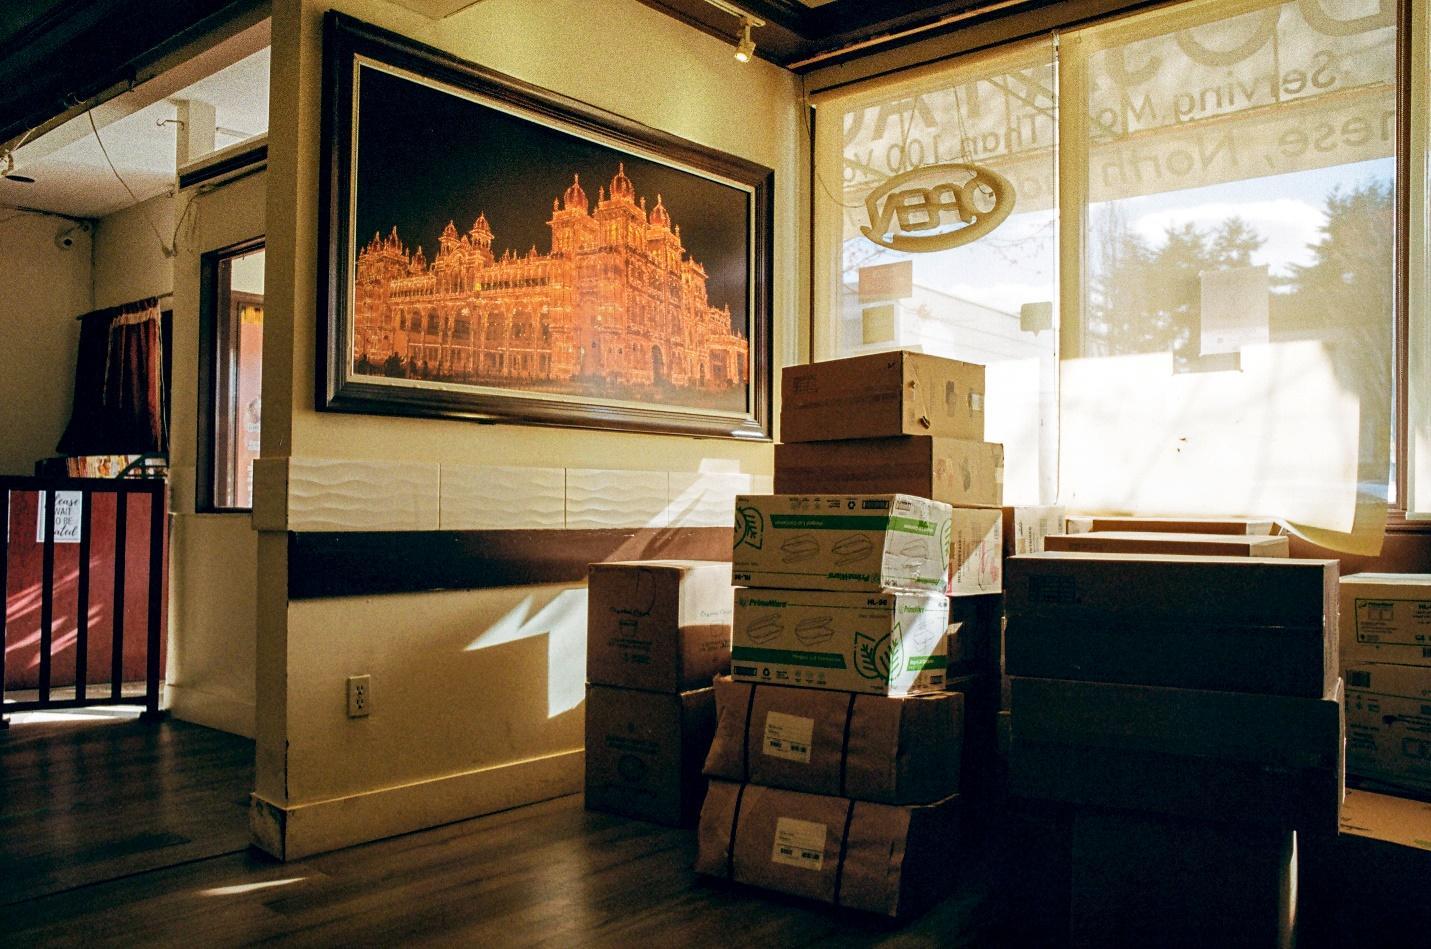 Why Should You Buy Or Make Cardboard Furniture